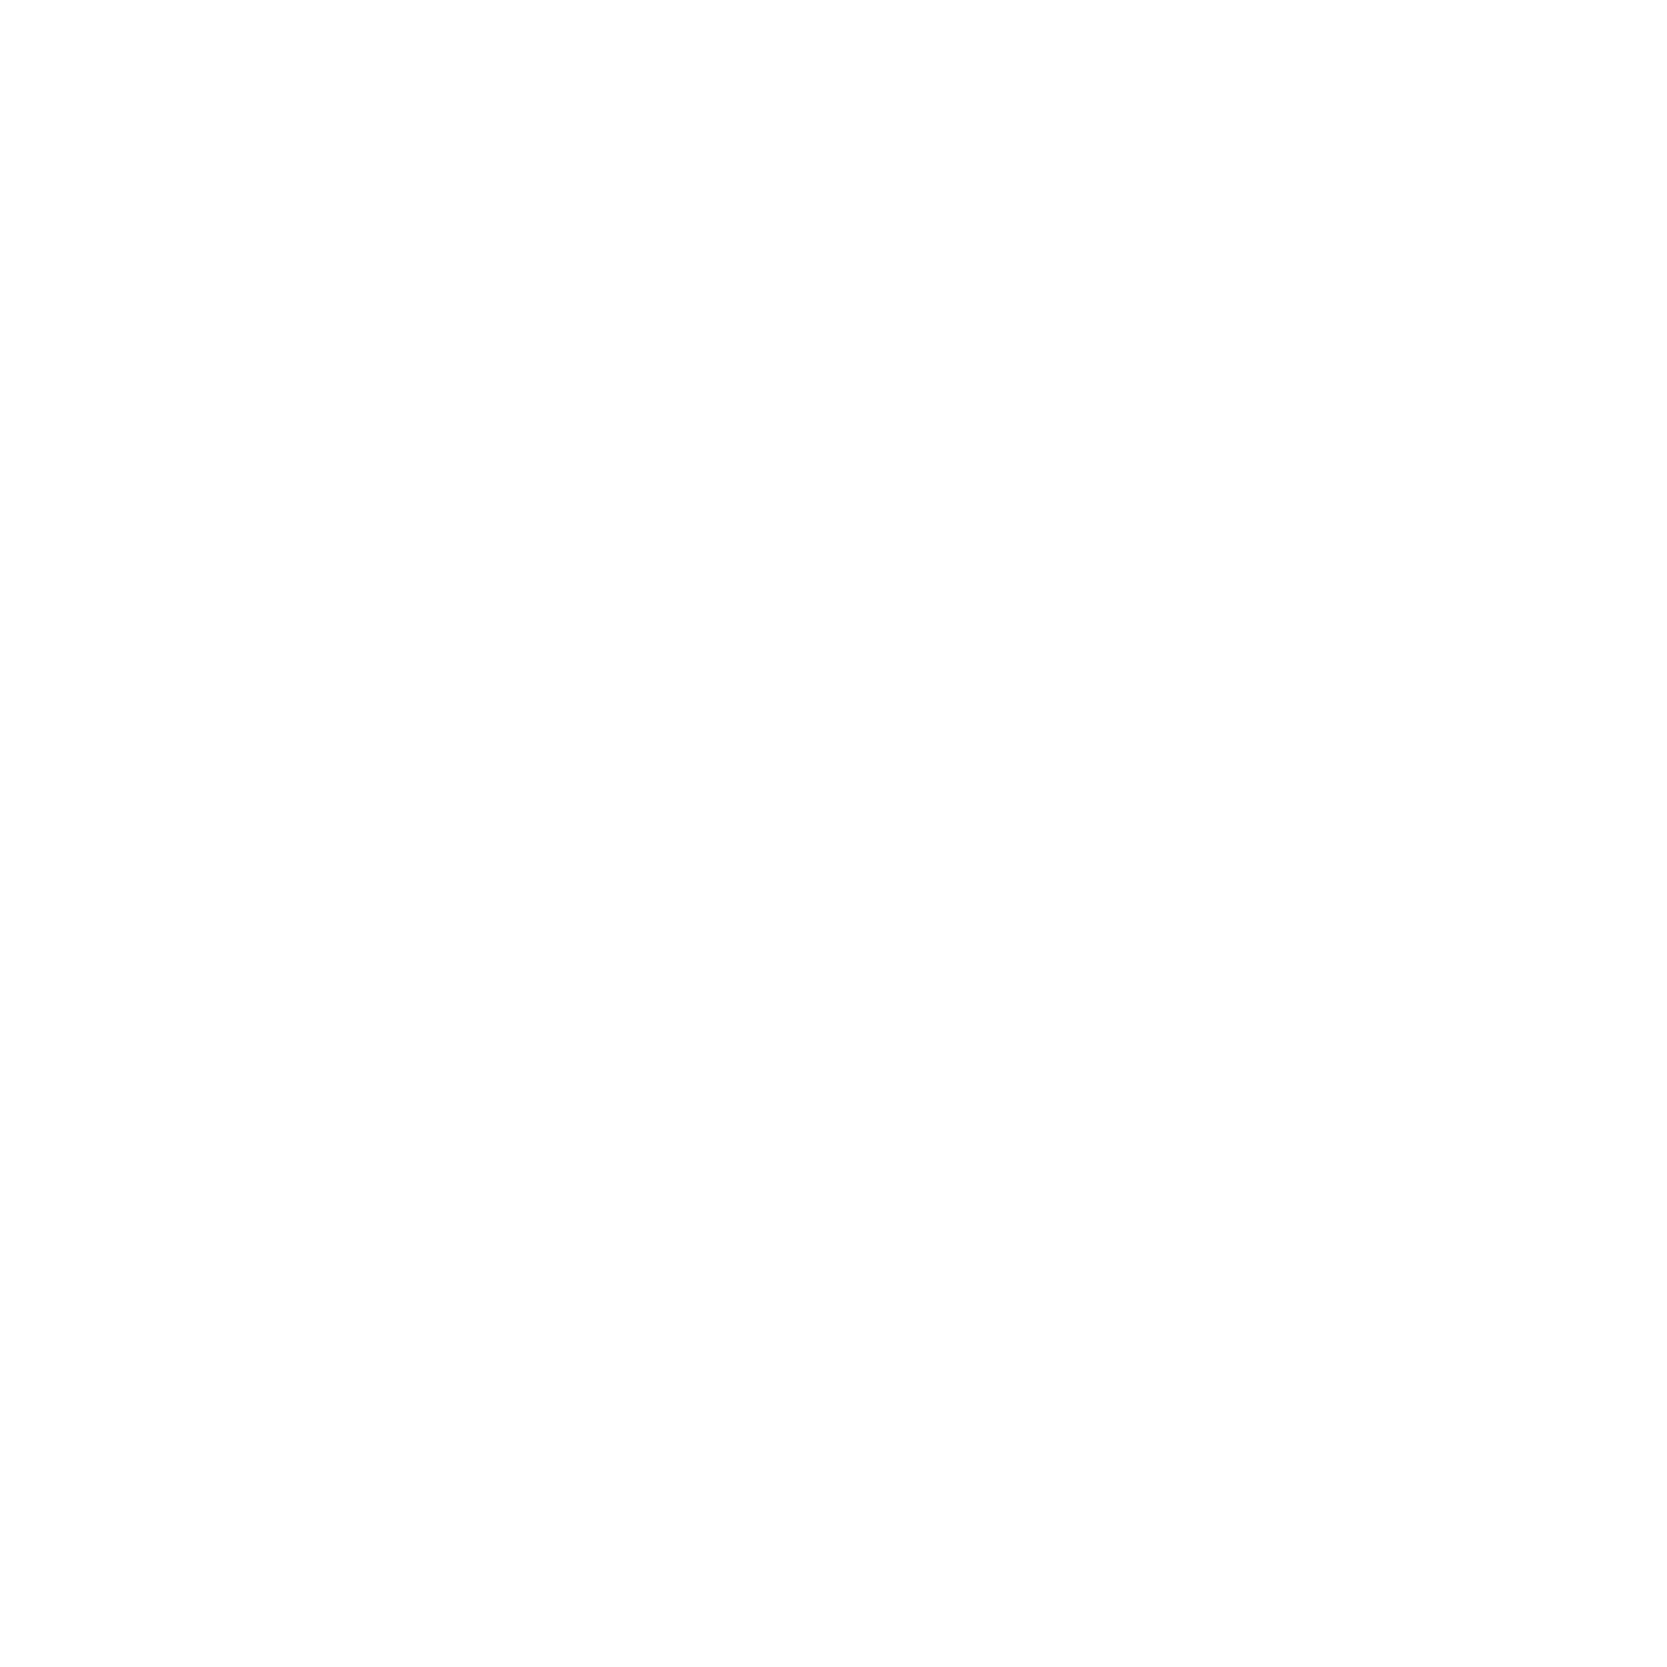 A TIFIN Company